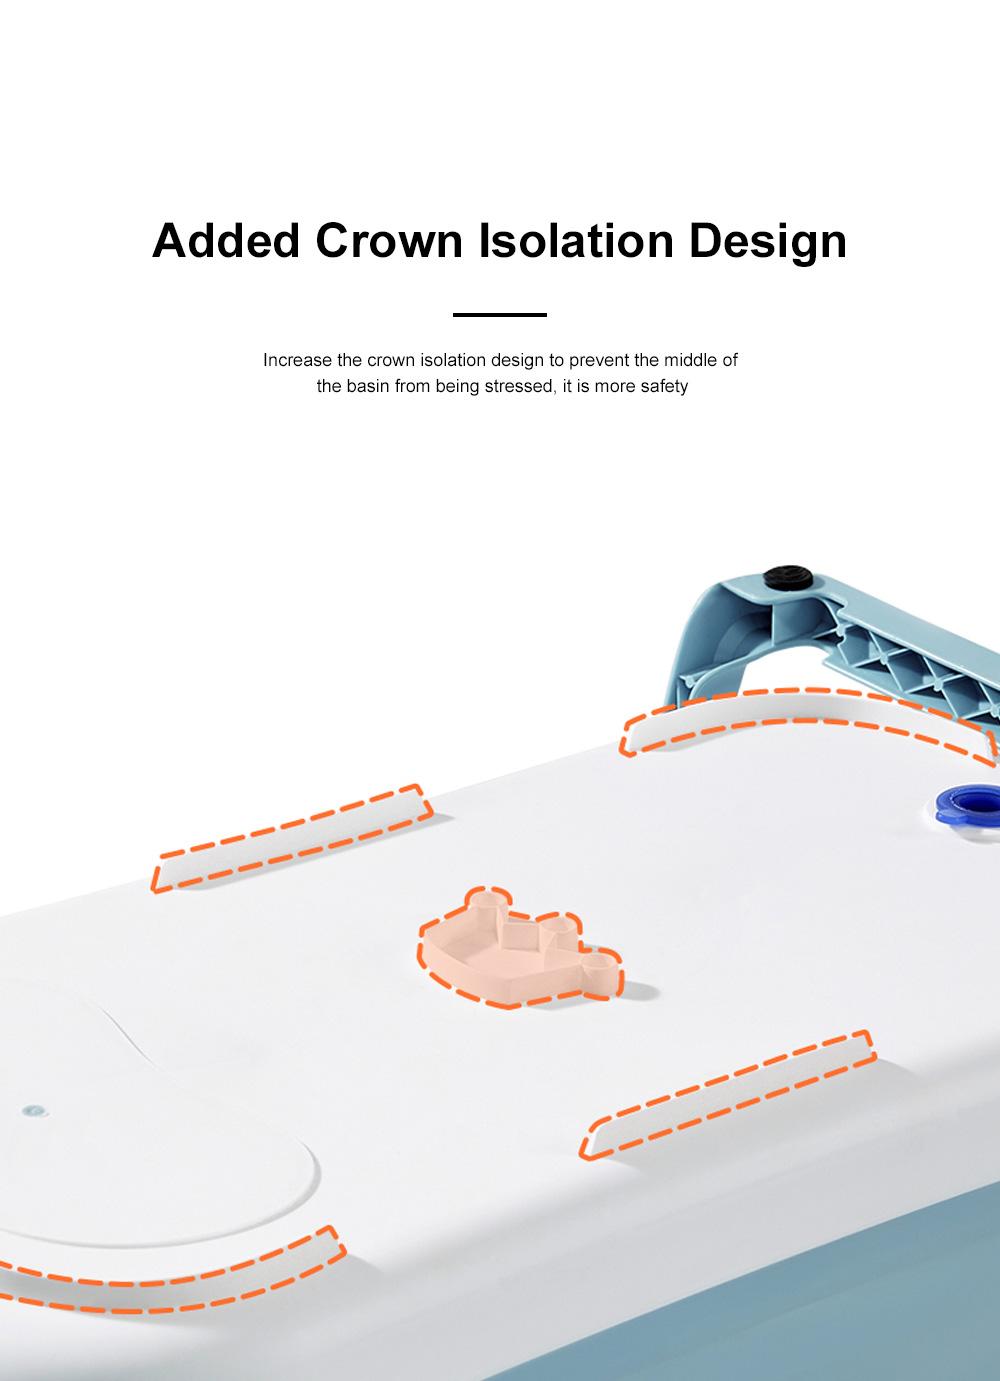 Portable Folding Baby Bath Tub Anti-Slip Bottom Non-Toxic Material Children Bathtub Bucket For Baby within 5 Year Old 9